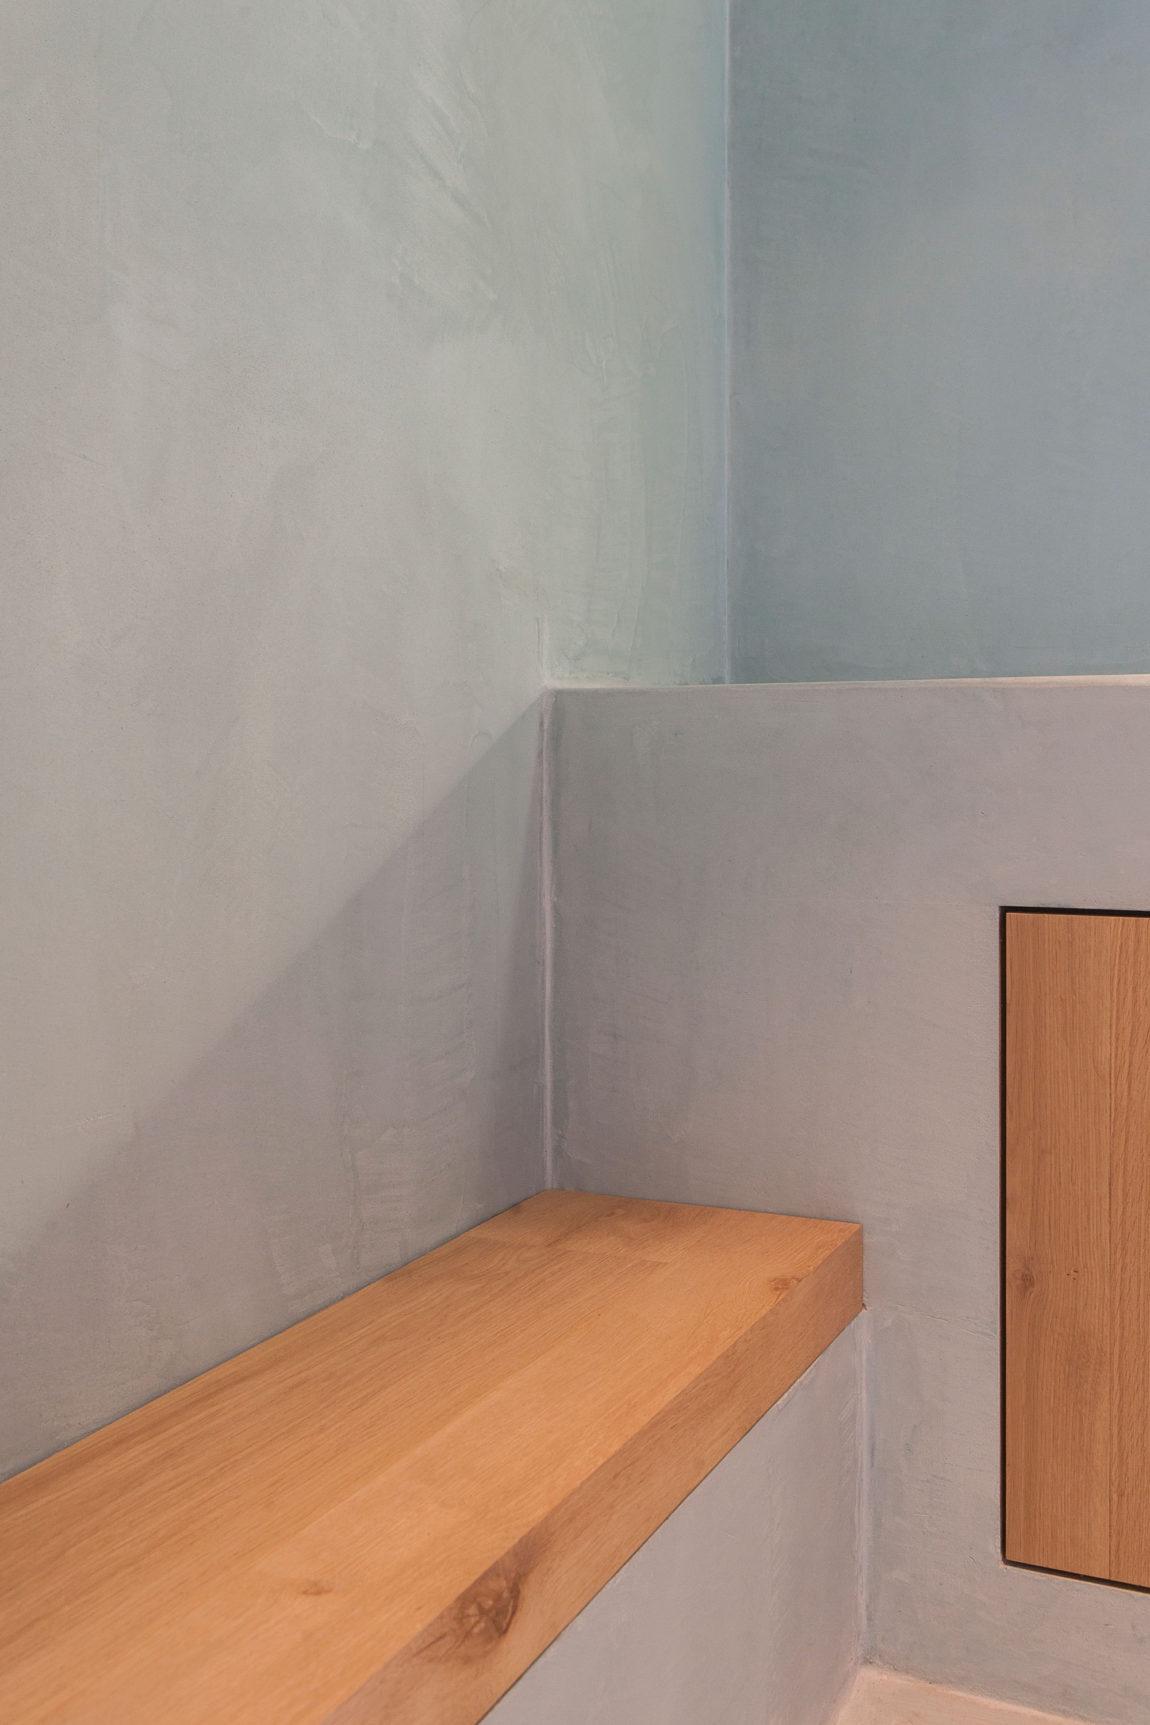 Interieur schuur LM badkamer IMG 0903